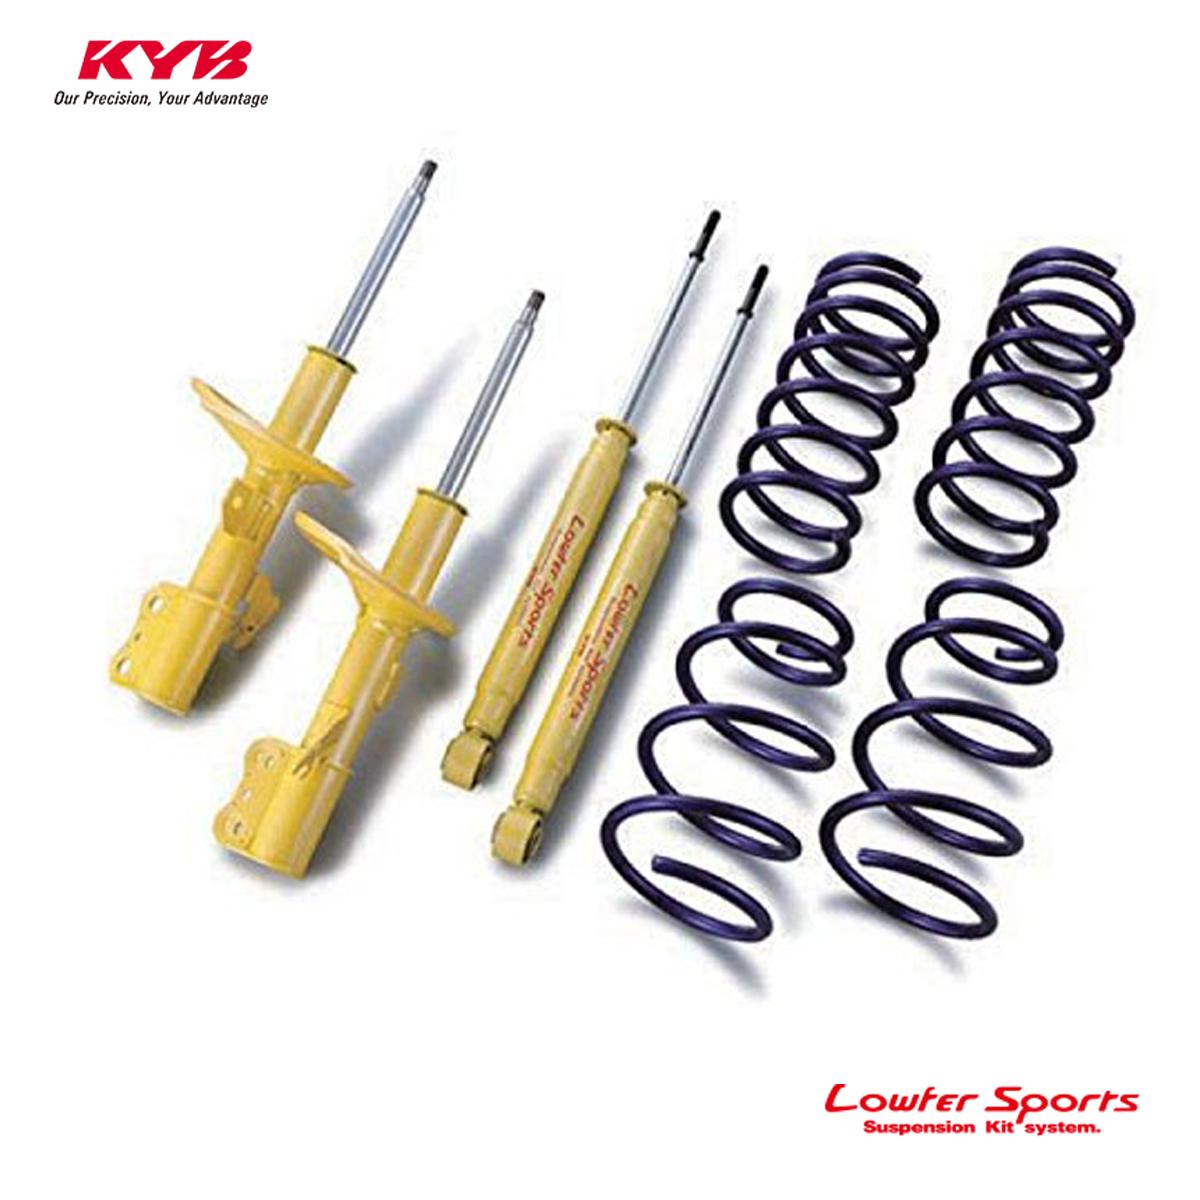 KYB カヤバ ムーヴ L902S ショックアブソーバー サスペンションキット Lowfer Sports LKIT-L902S 配送先条件有り